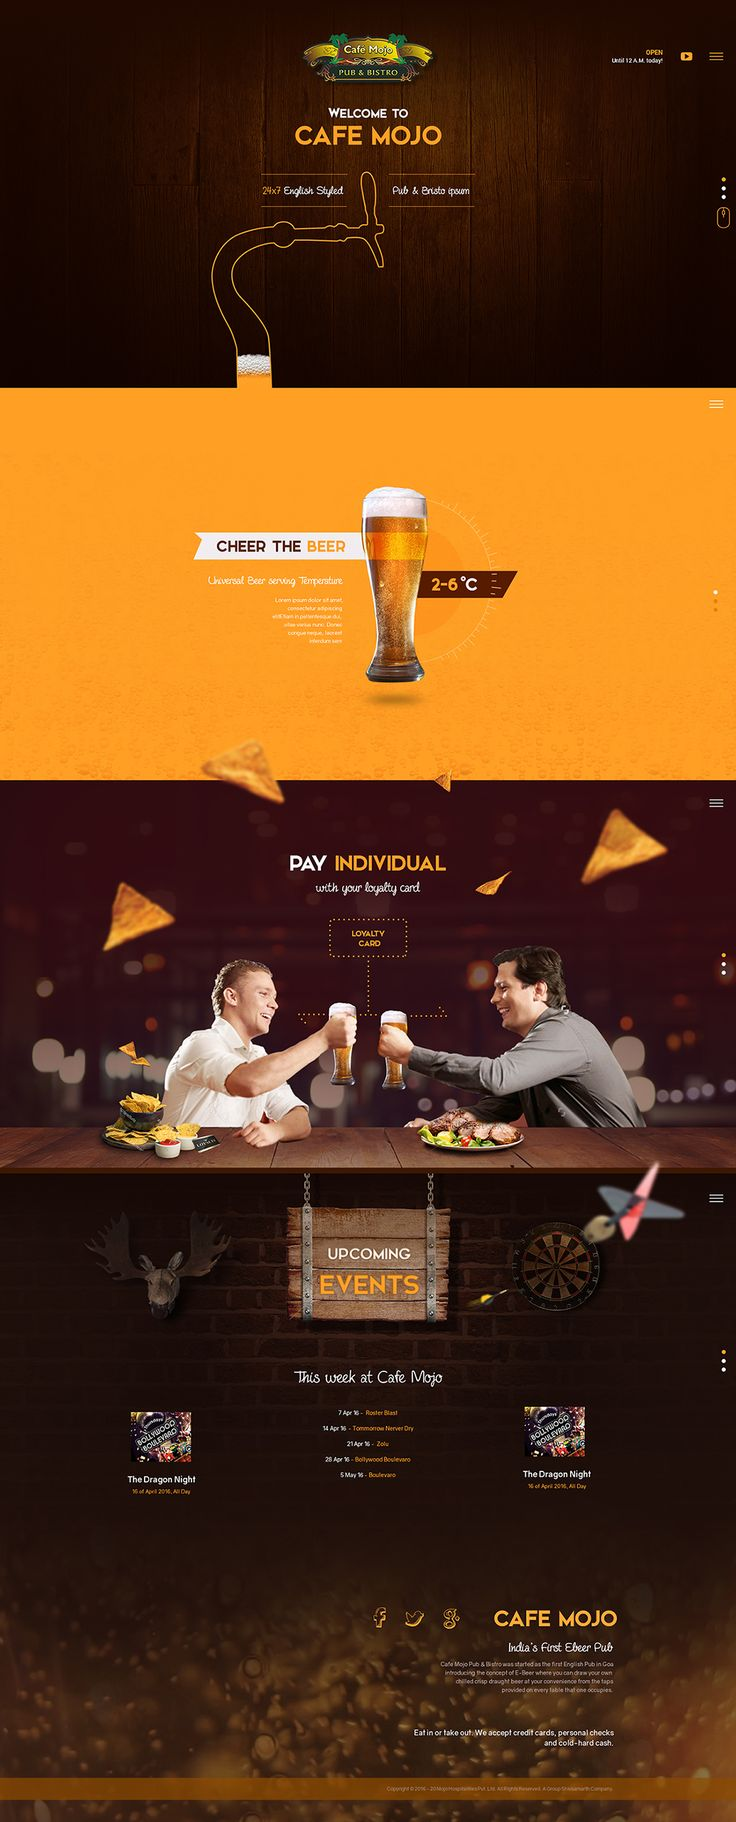 Cafe Mojo Website Design